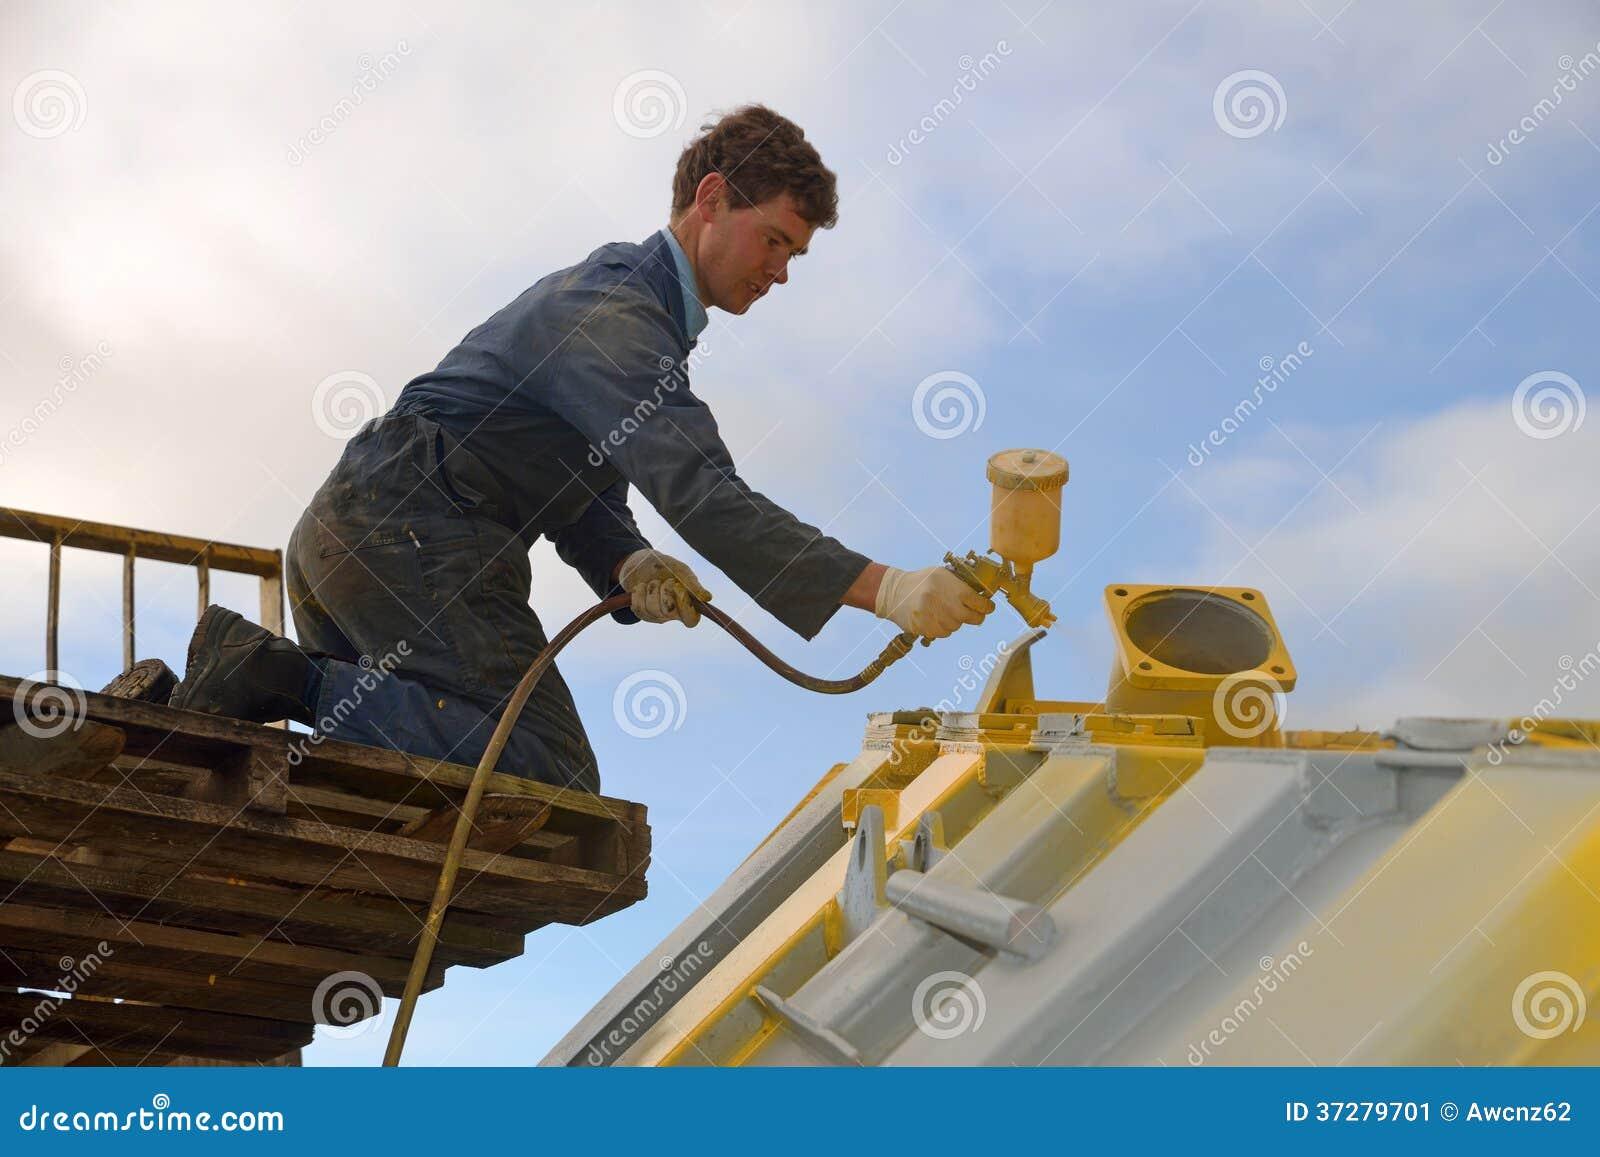 Spraying the truck